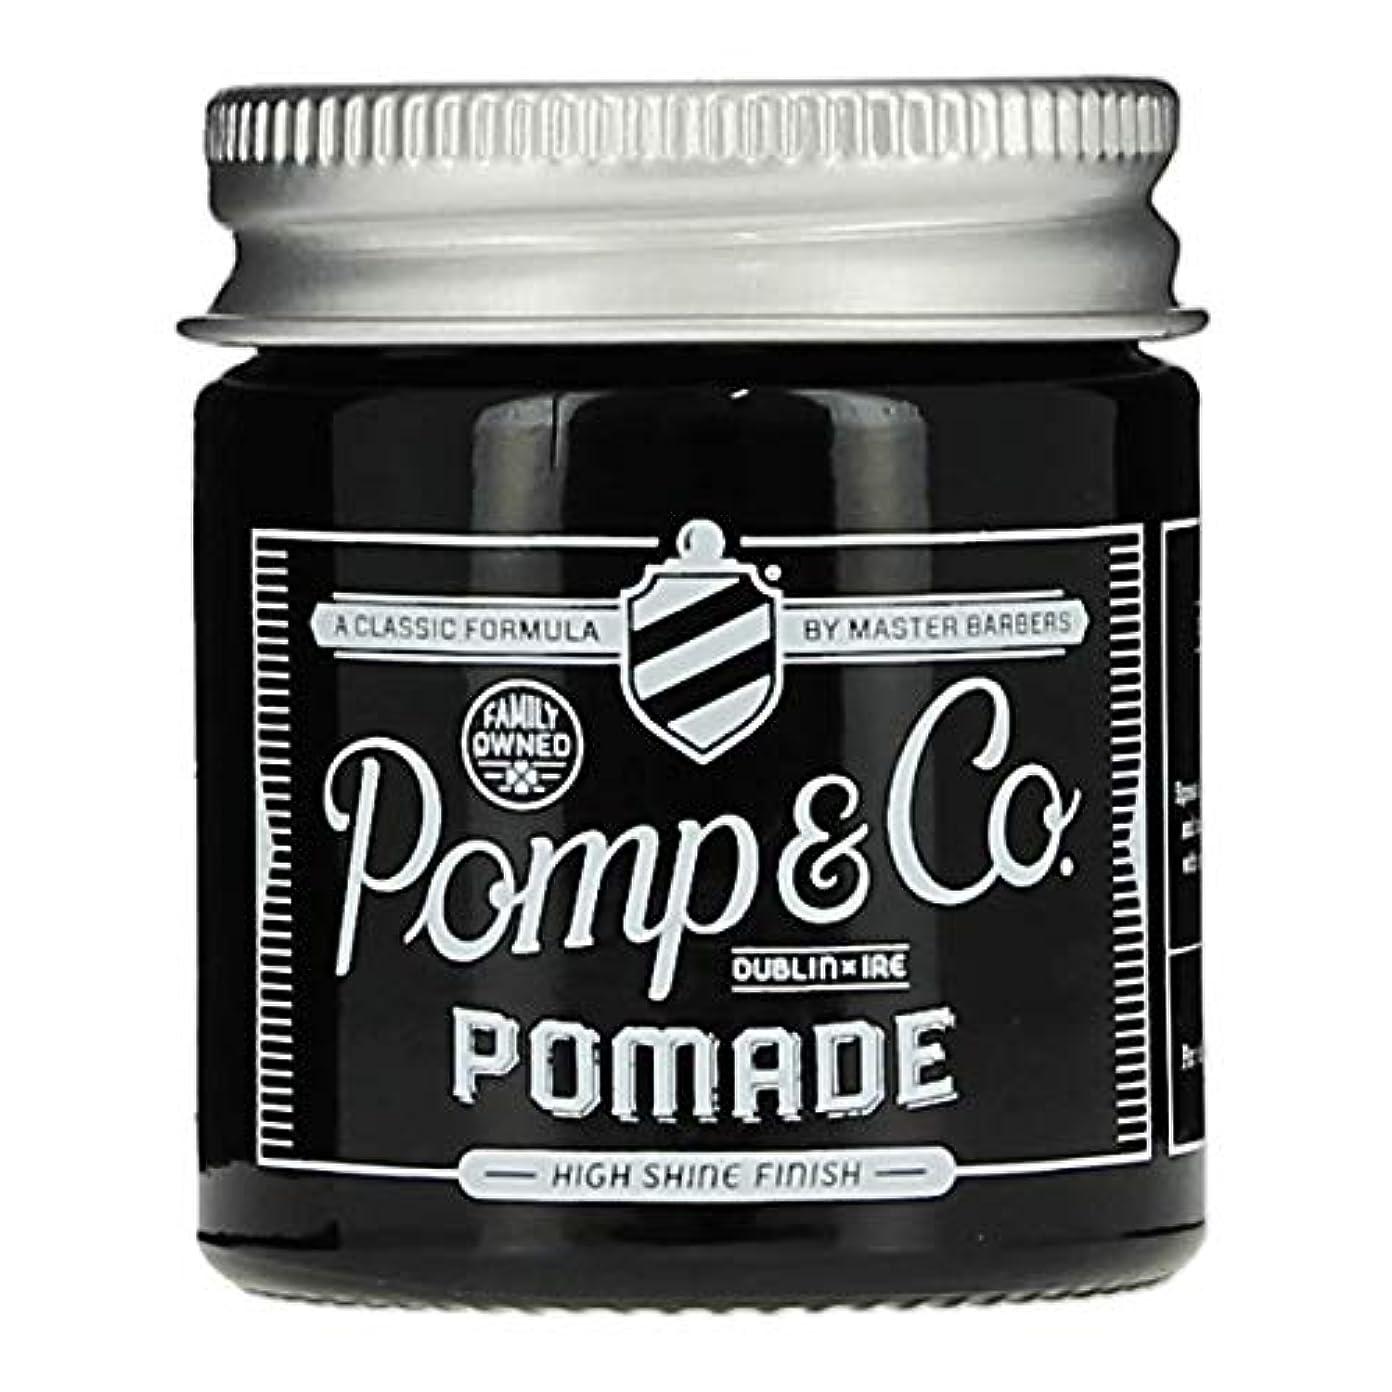 Pomp & Co ポマード 1oz/ 28ml[海外直送品] [並行輸入品]